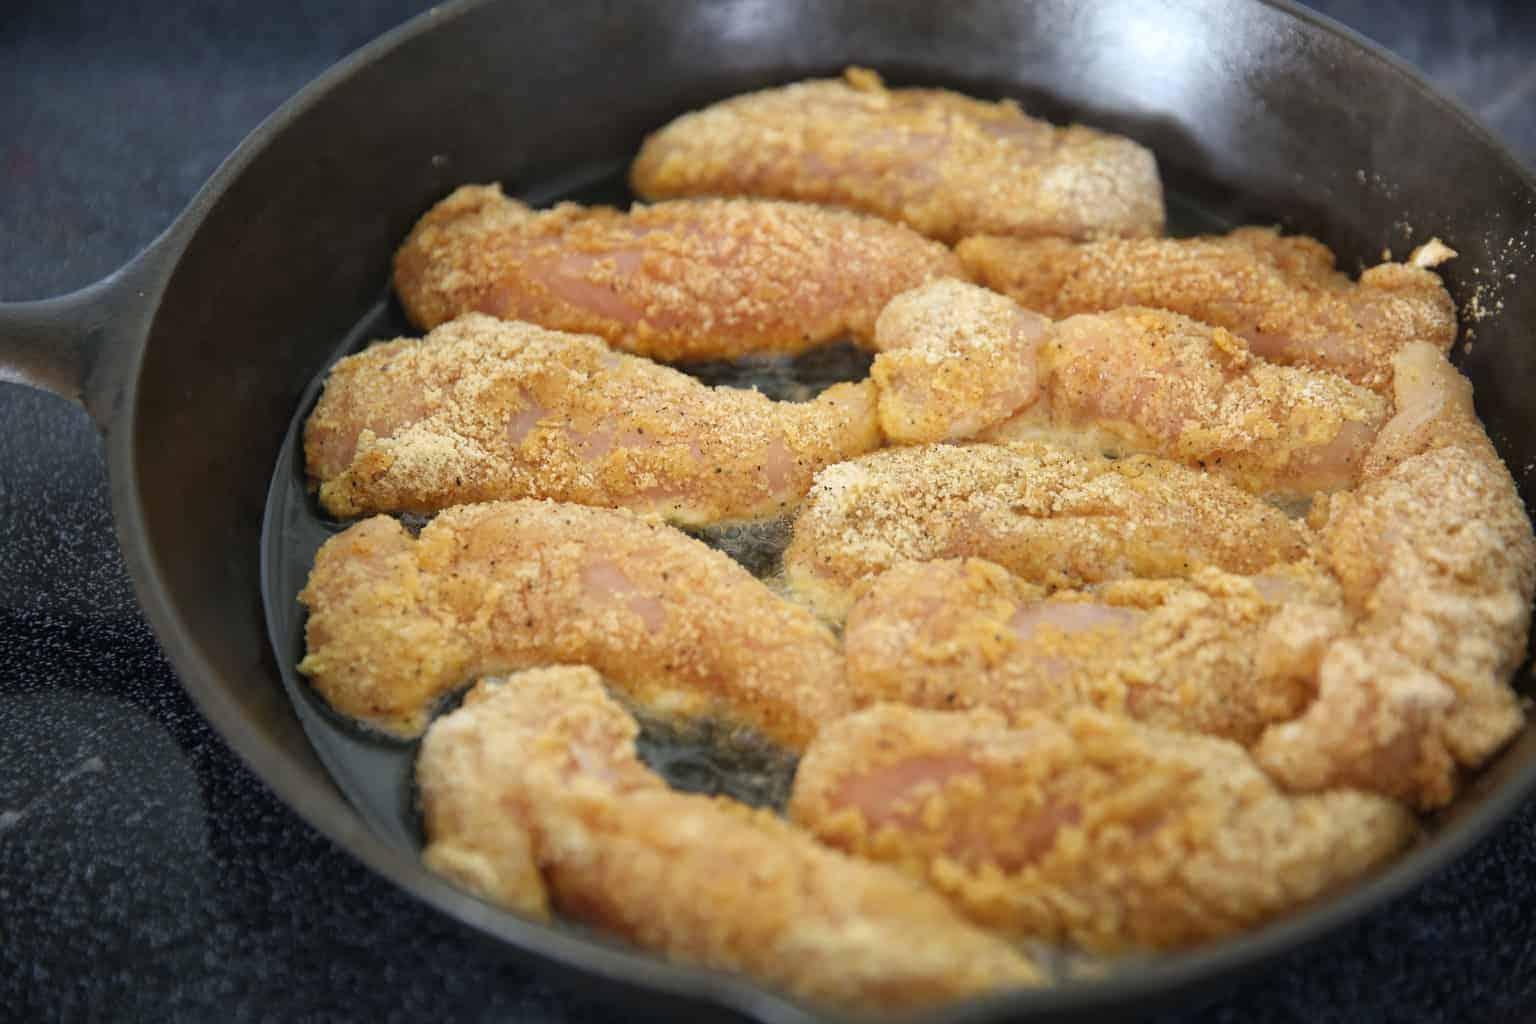 Frying chicken strips in cast iron skillet.